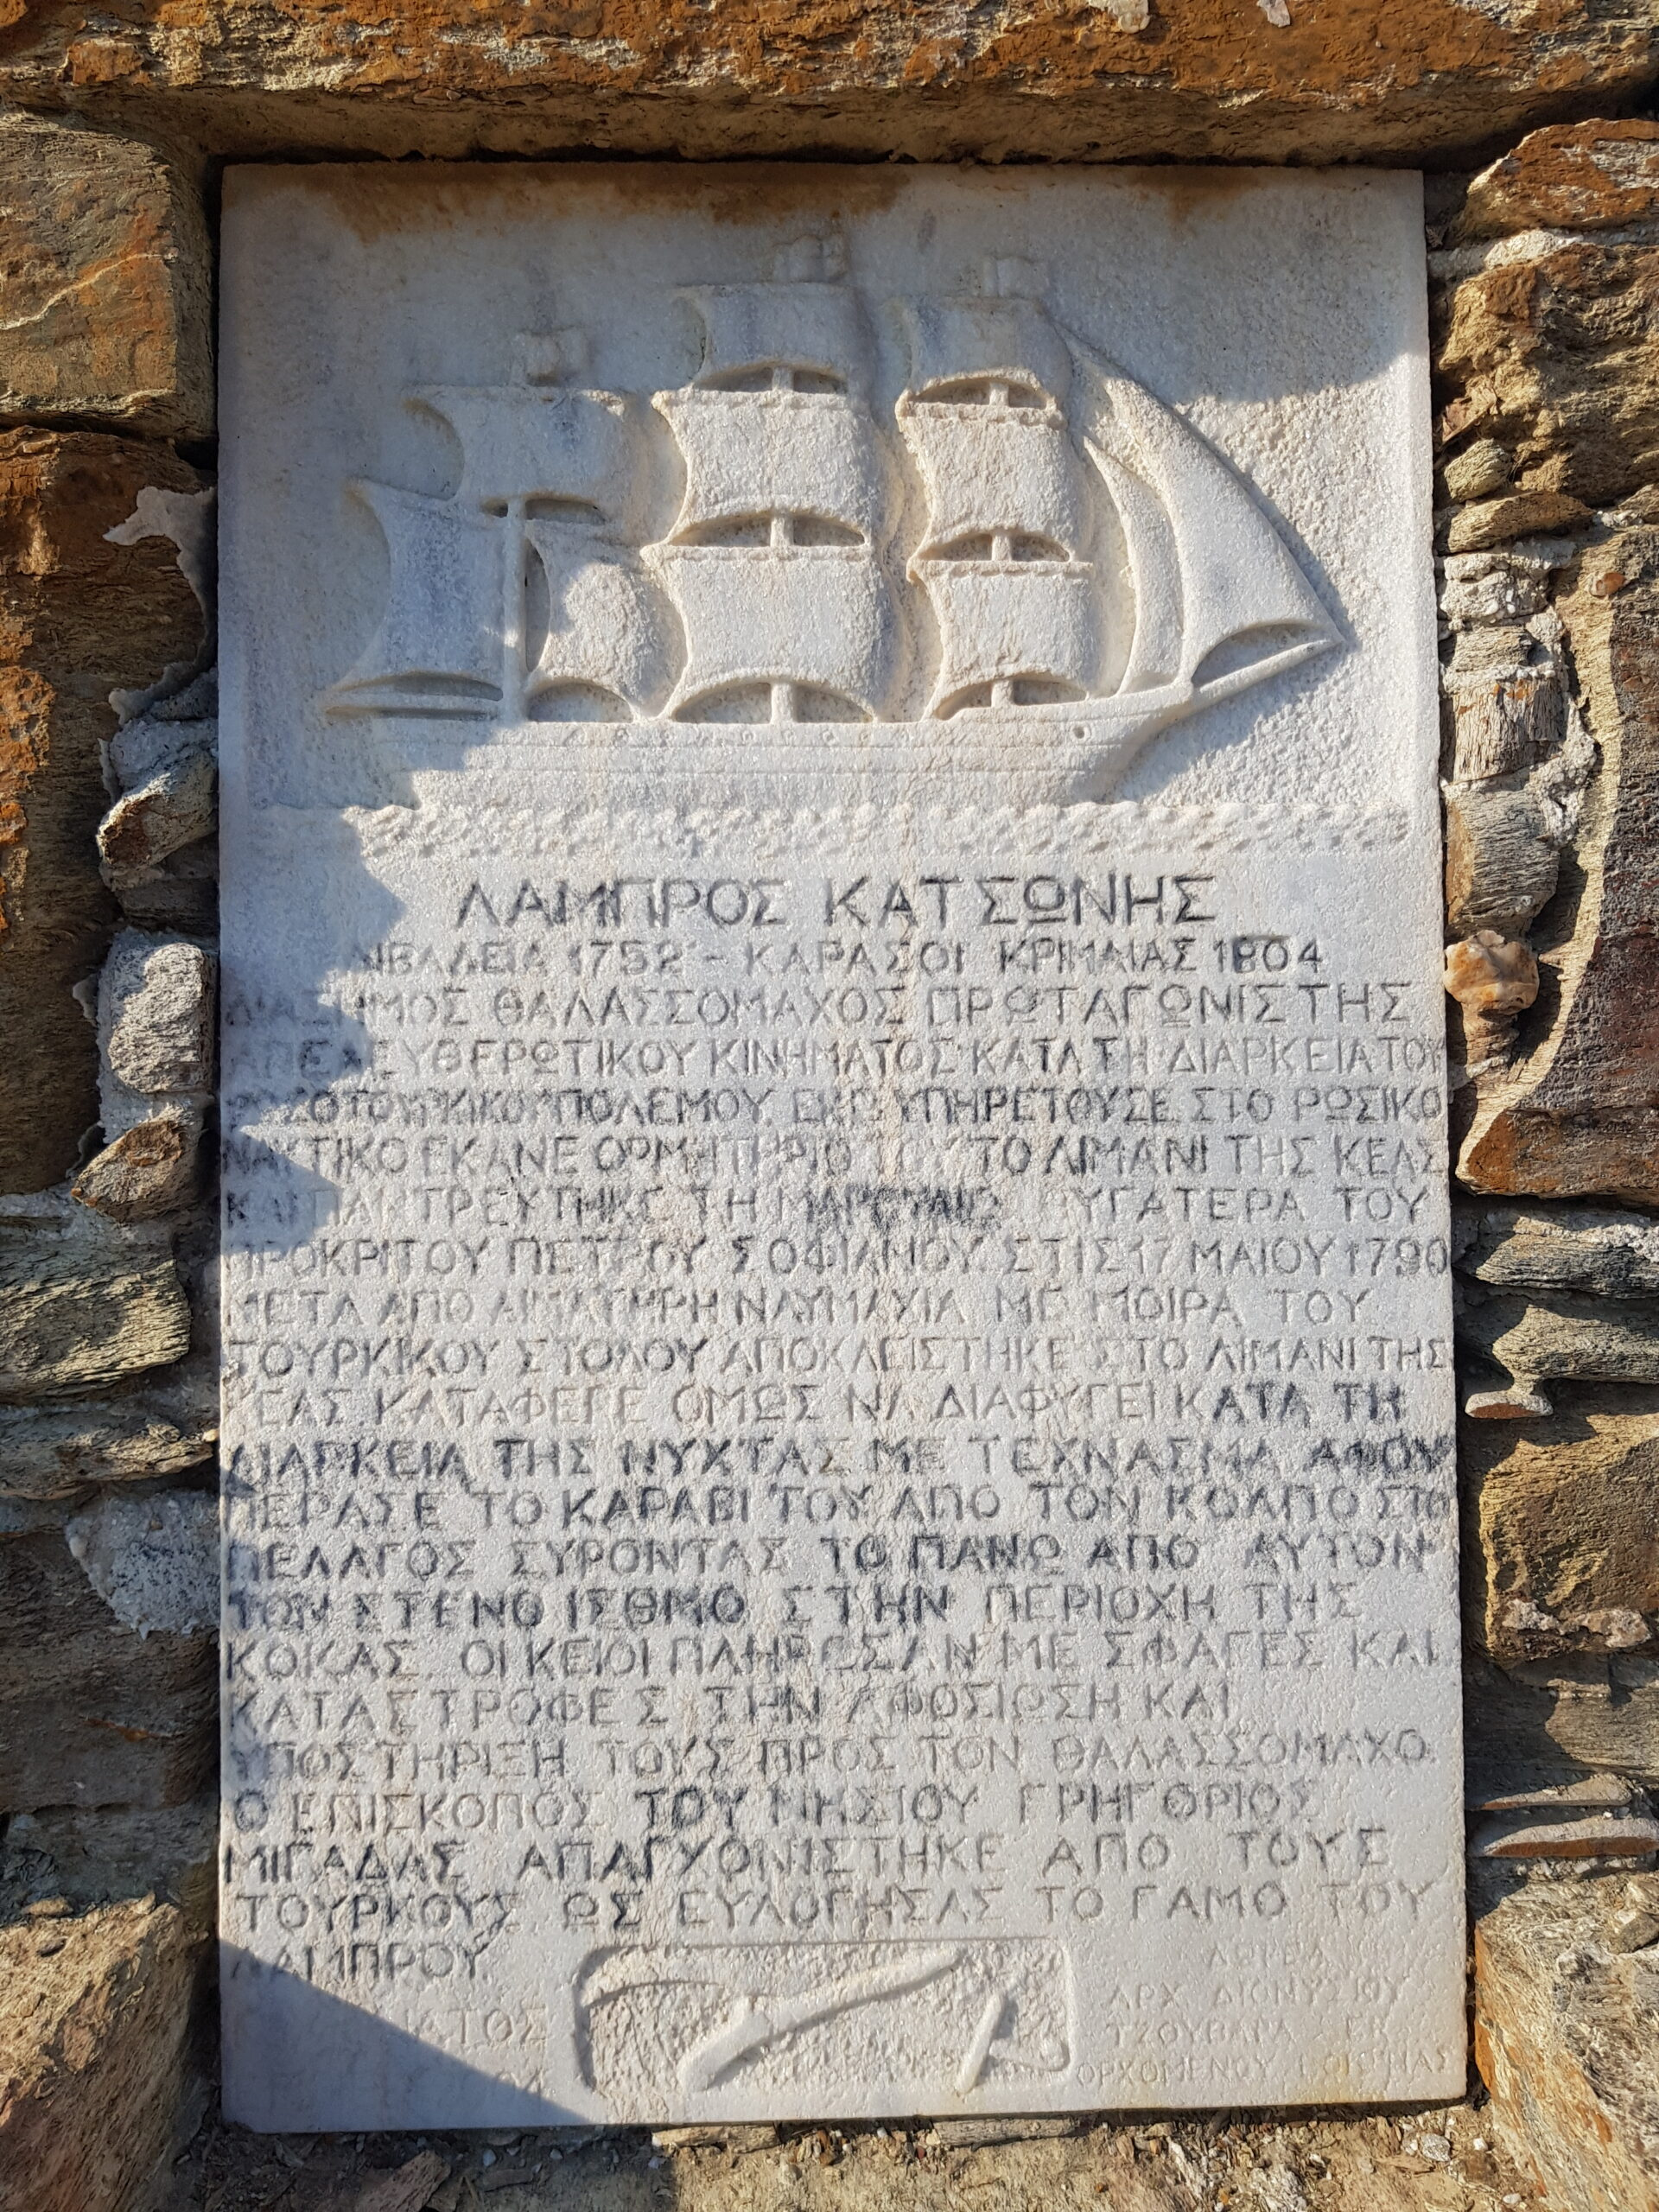 <strong>Η ιστορία της απόδρασης του Κατσώνη από το λιμάνι της Κέας</strong><br>